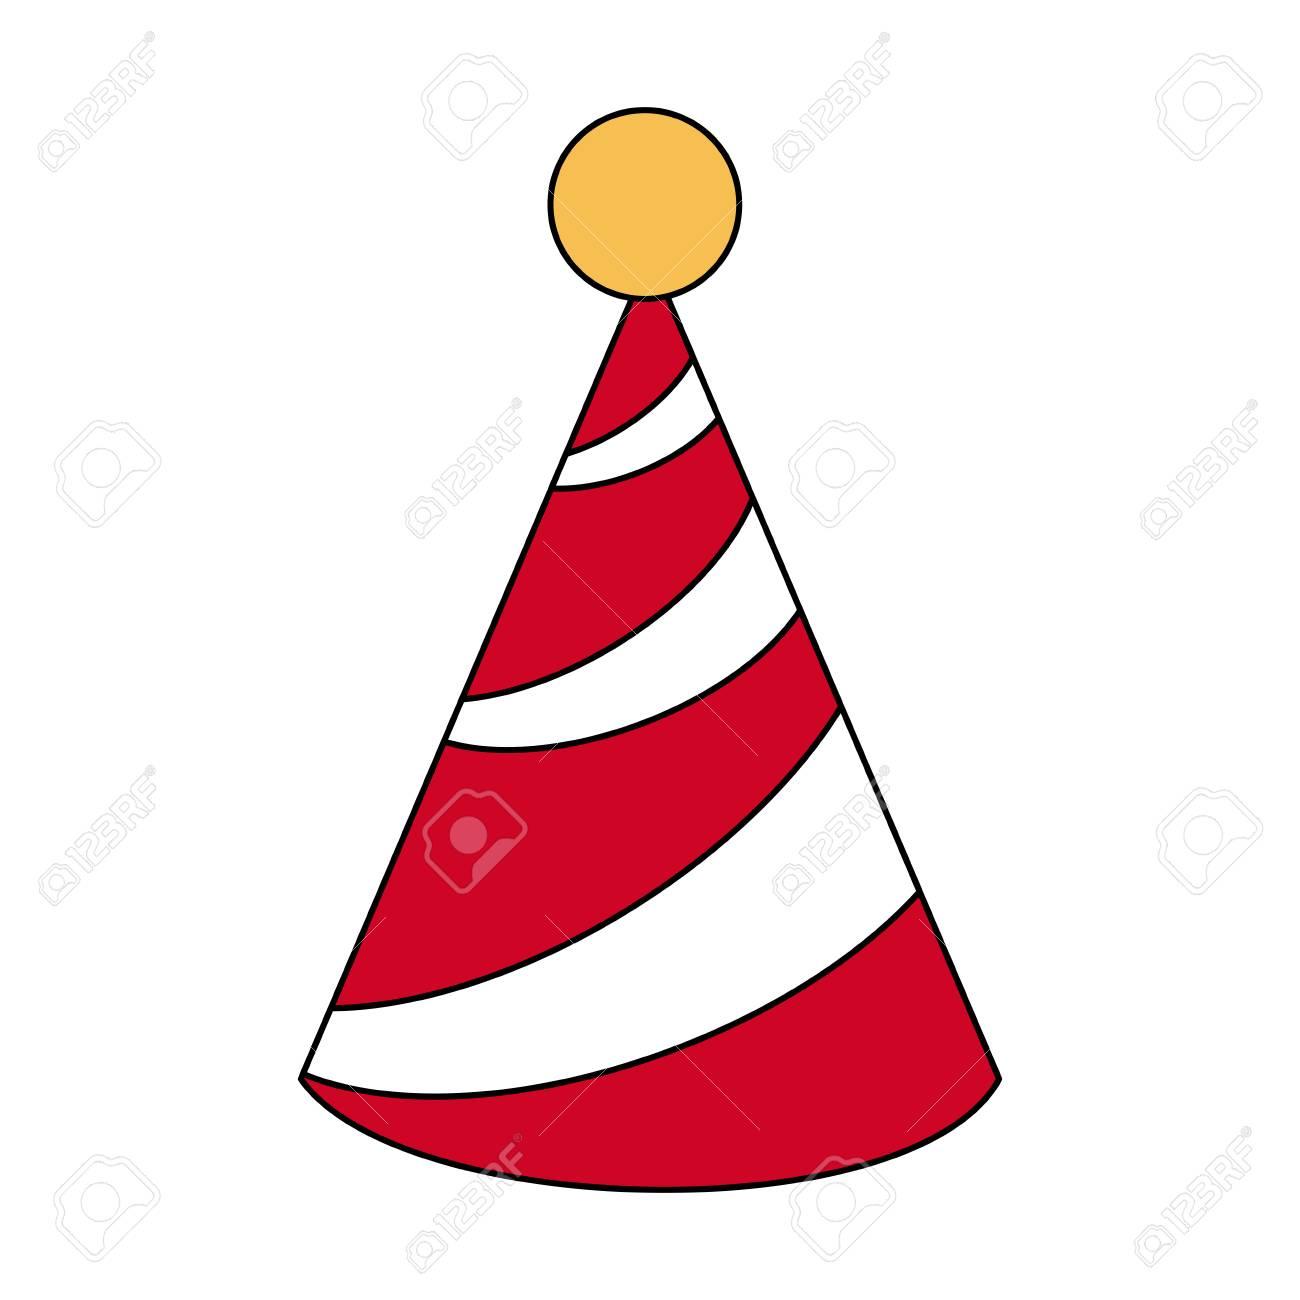 hight resolution of birthday hat symbol icon vector illustration graphic design stock vector 89512229